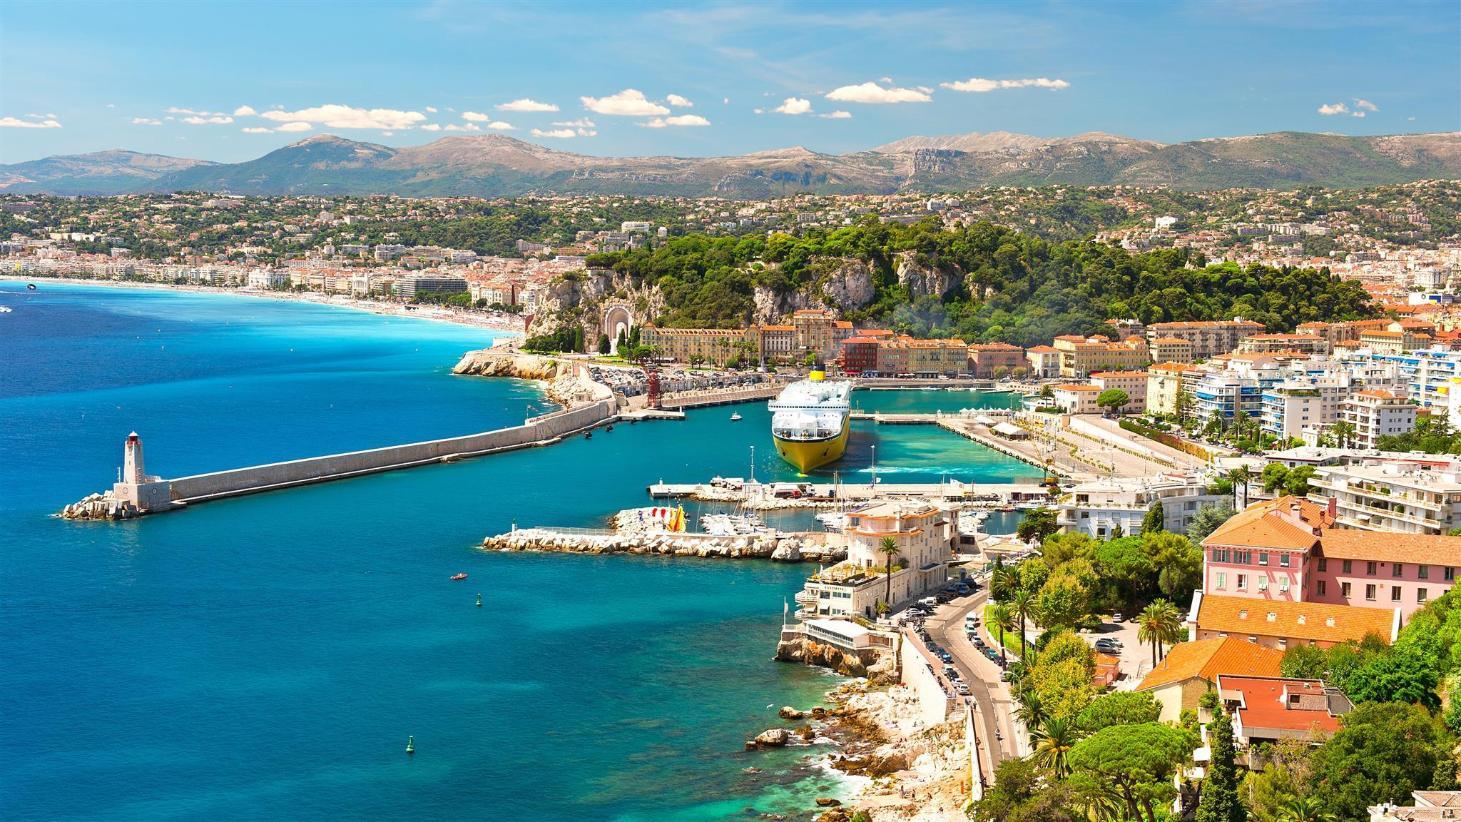 30 Best Nice Hotels In 2020 Great Savings Reviews Of Hotels In Nice France